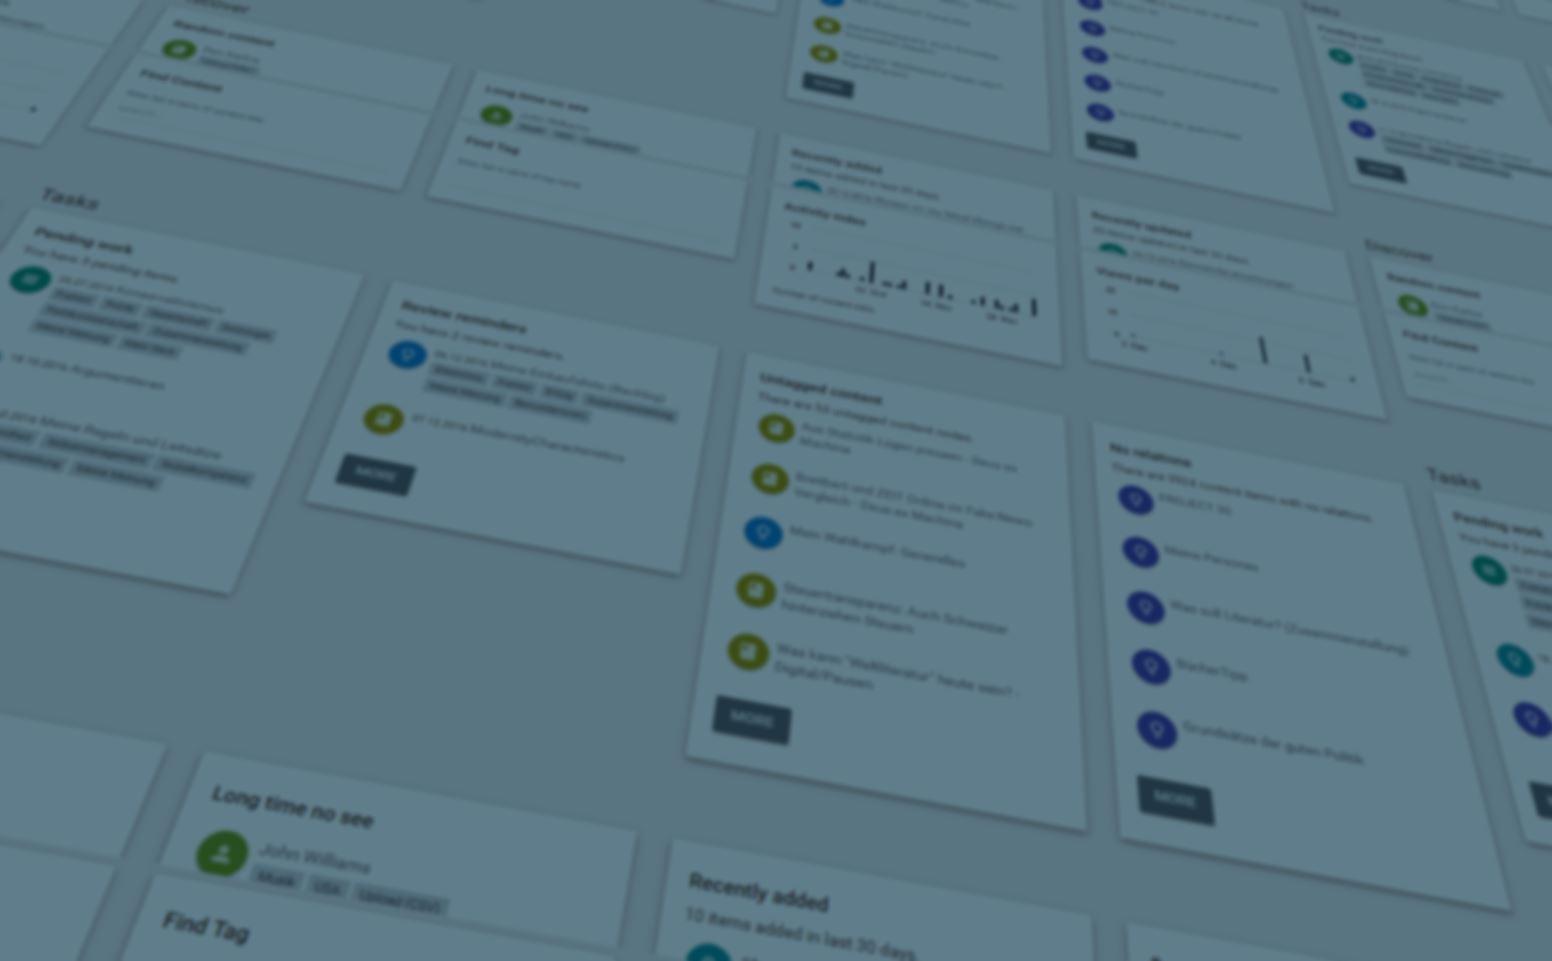 Raisin Picker   Knowledge management with Drupal 8 x